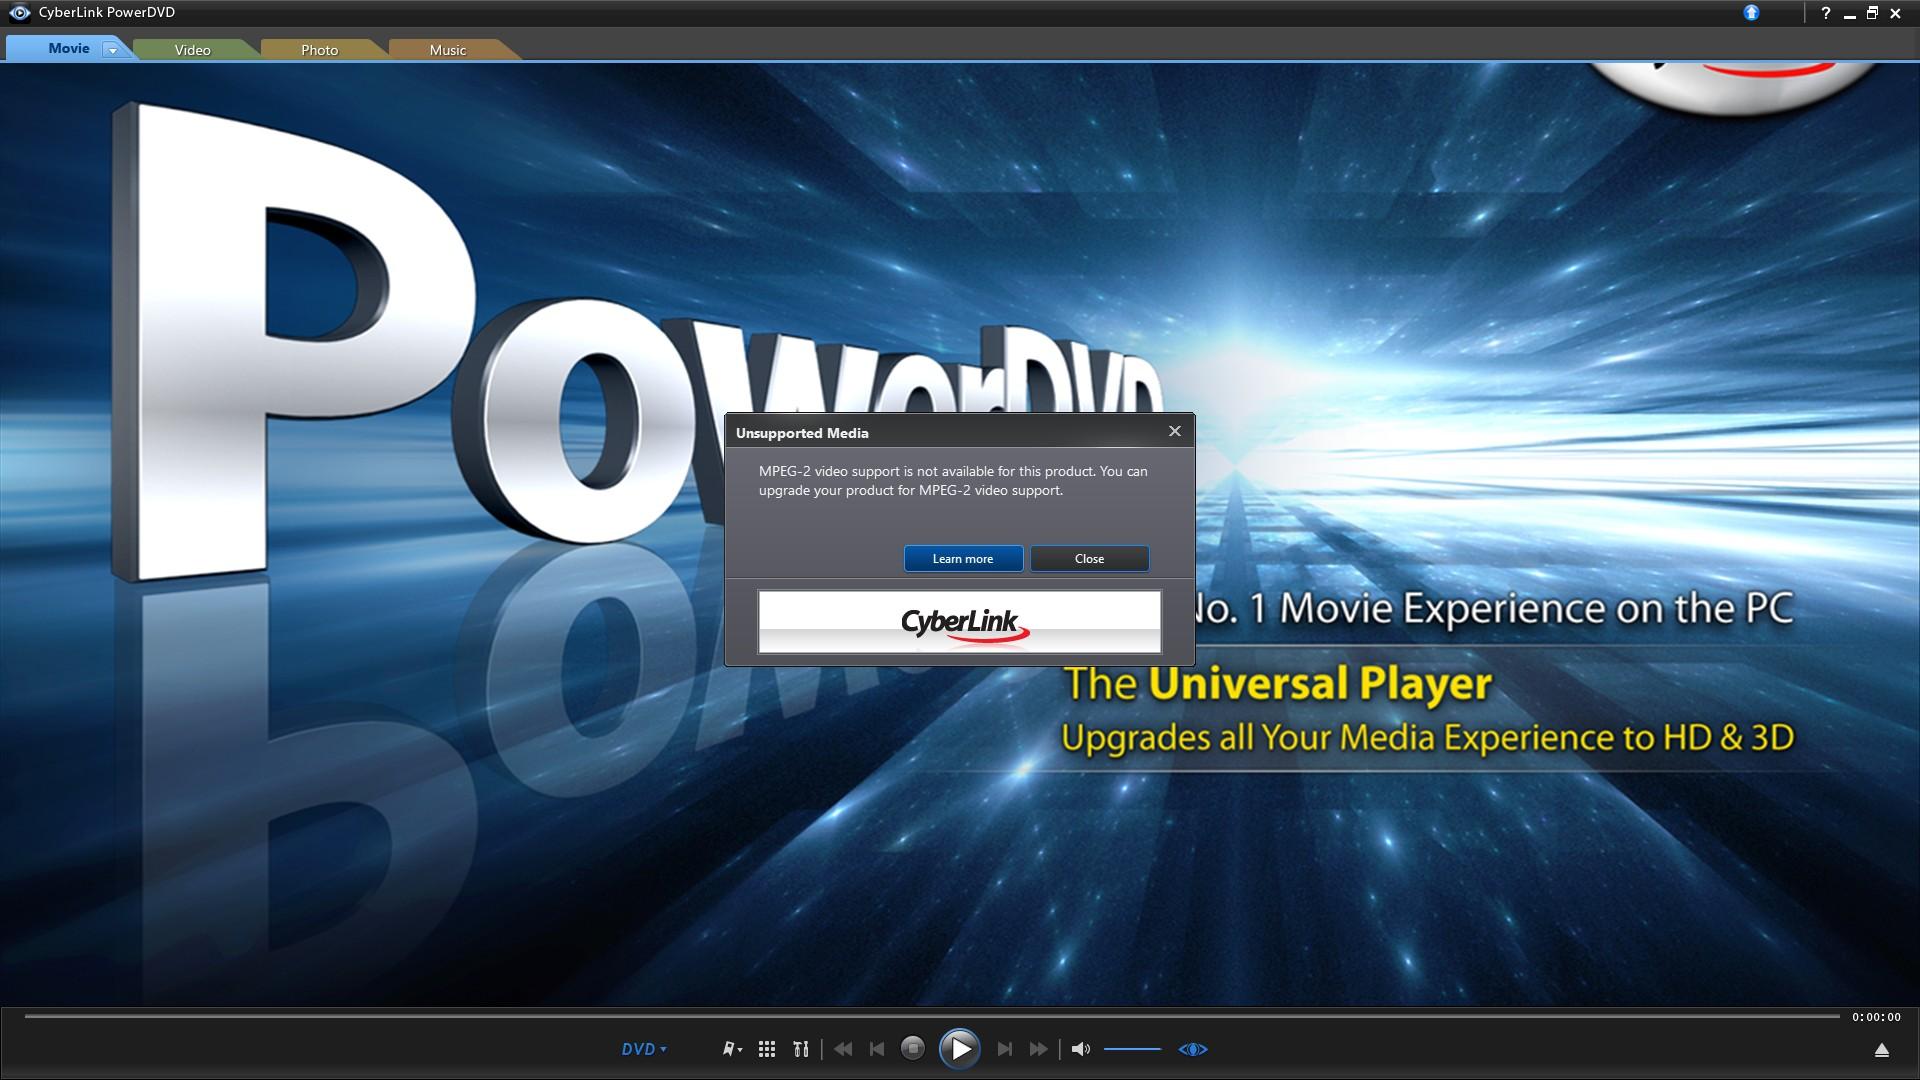 cyberlink powerdvd windows 10 download